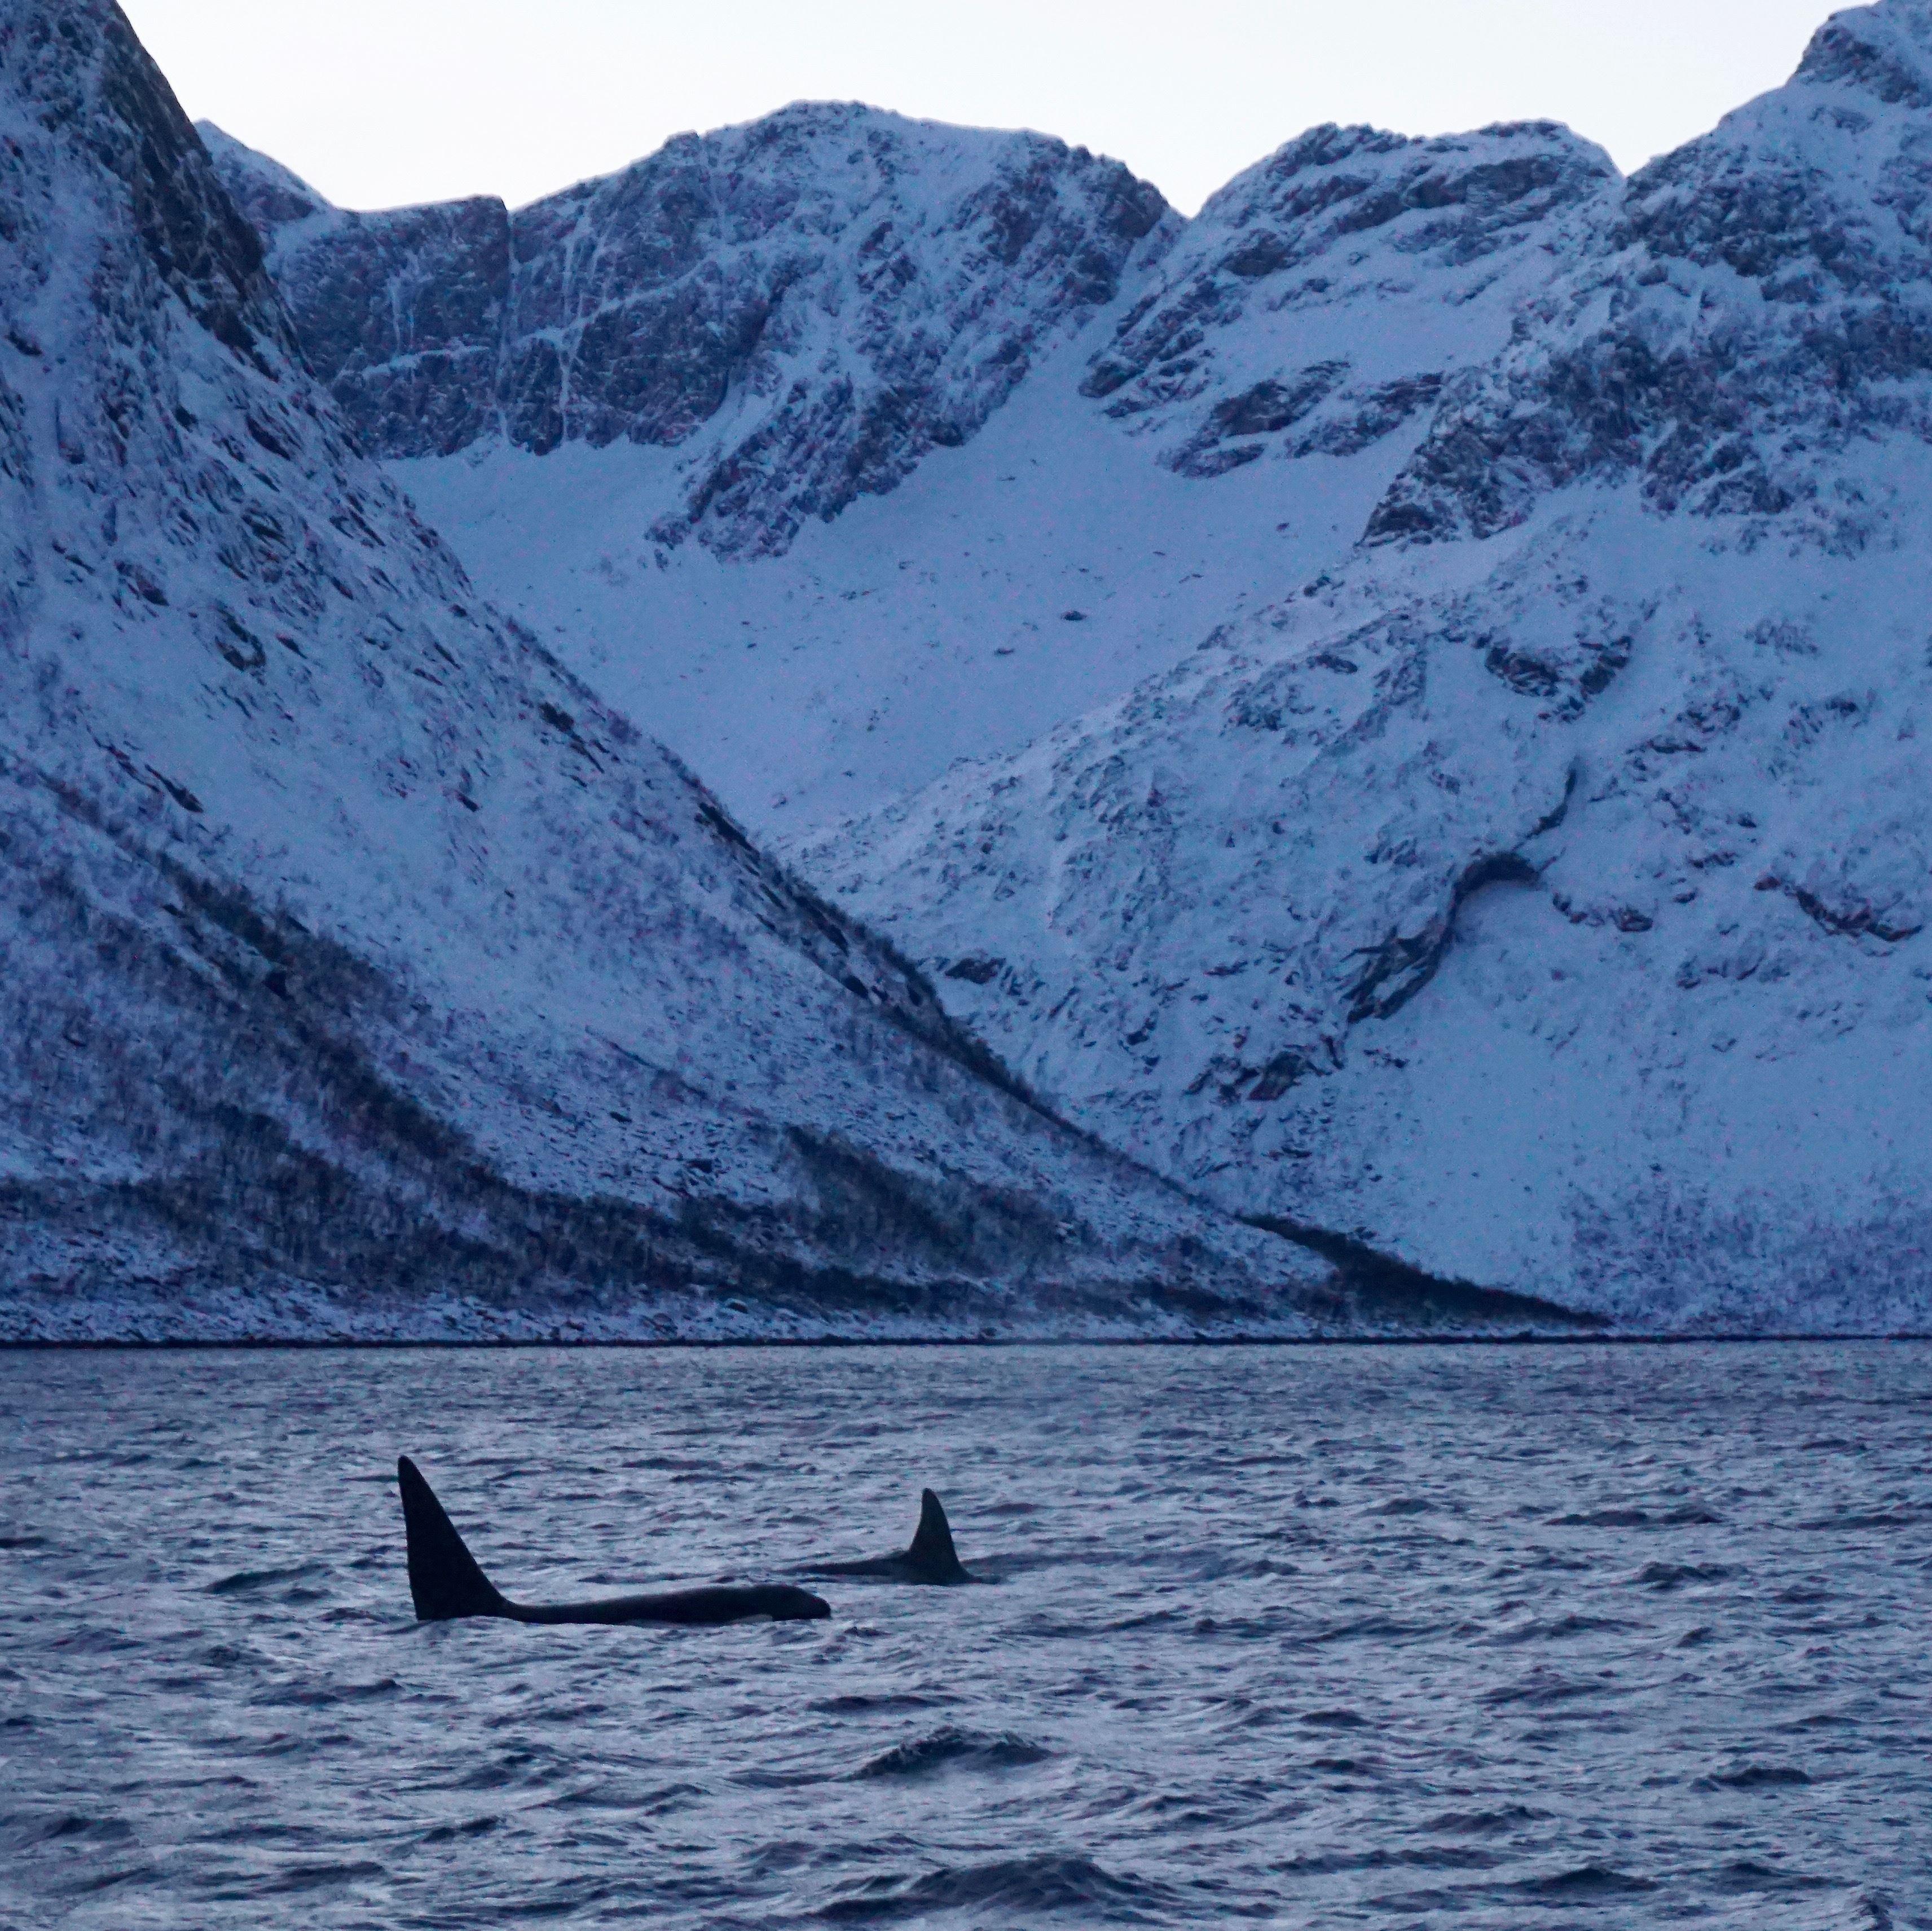 Whale Research Safari - Wild Seas